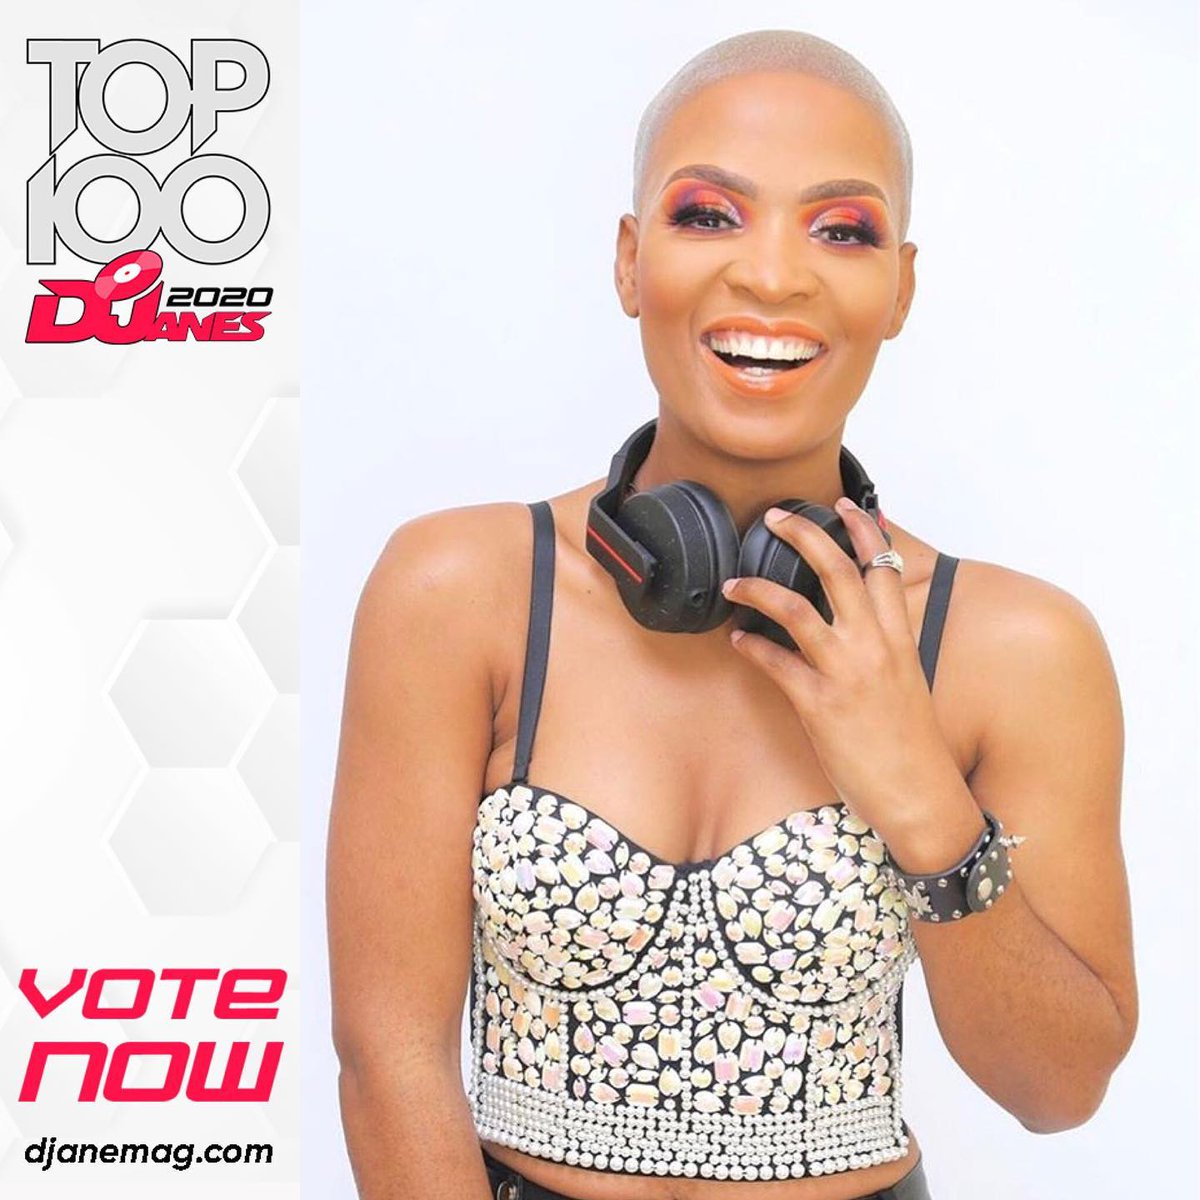 Virus will go away, Music will stay forever! VOTE NOW for @djhappygalsa on http://djanemag.com http://top100djanes.com #djanemag #top100djanes #dj #djs #djlife #djingpic.twitter.com/0bW76noTfz